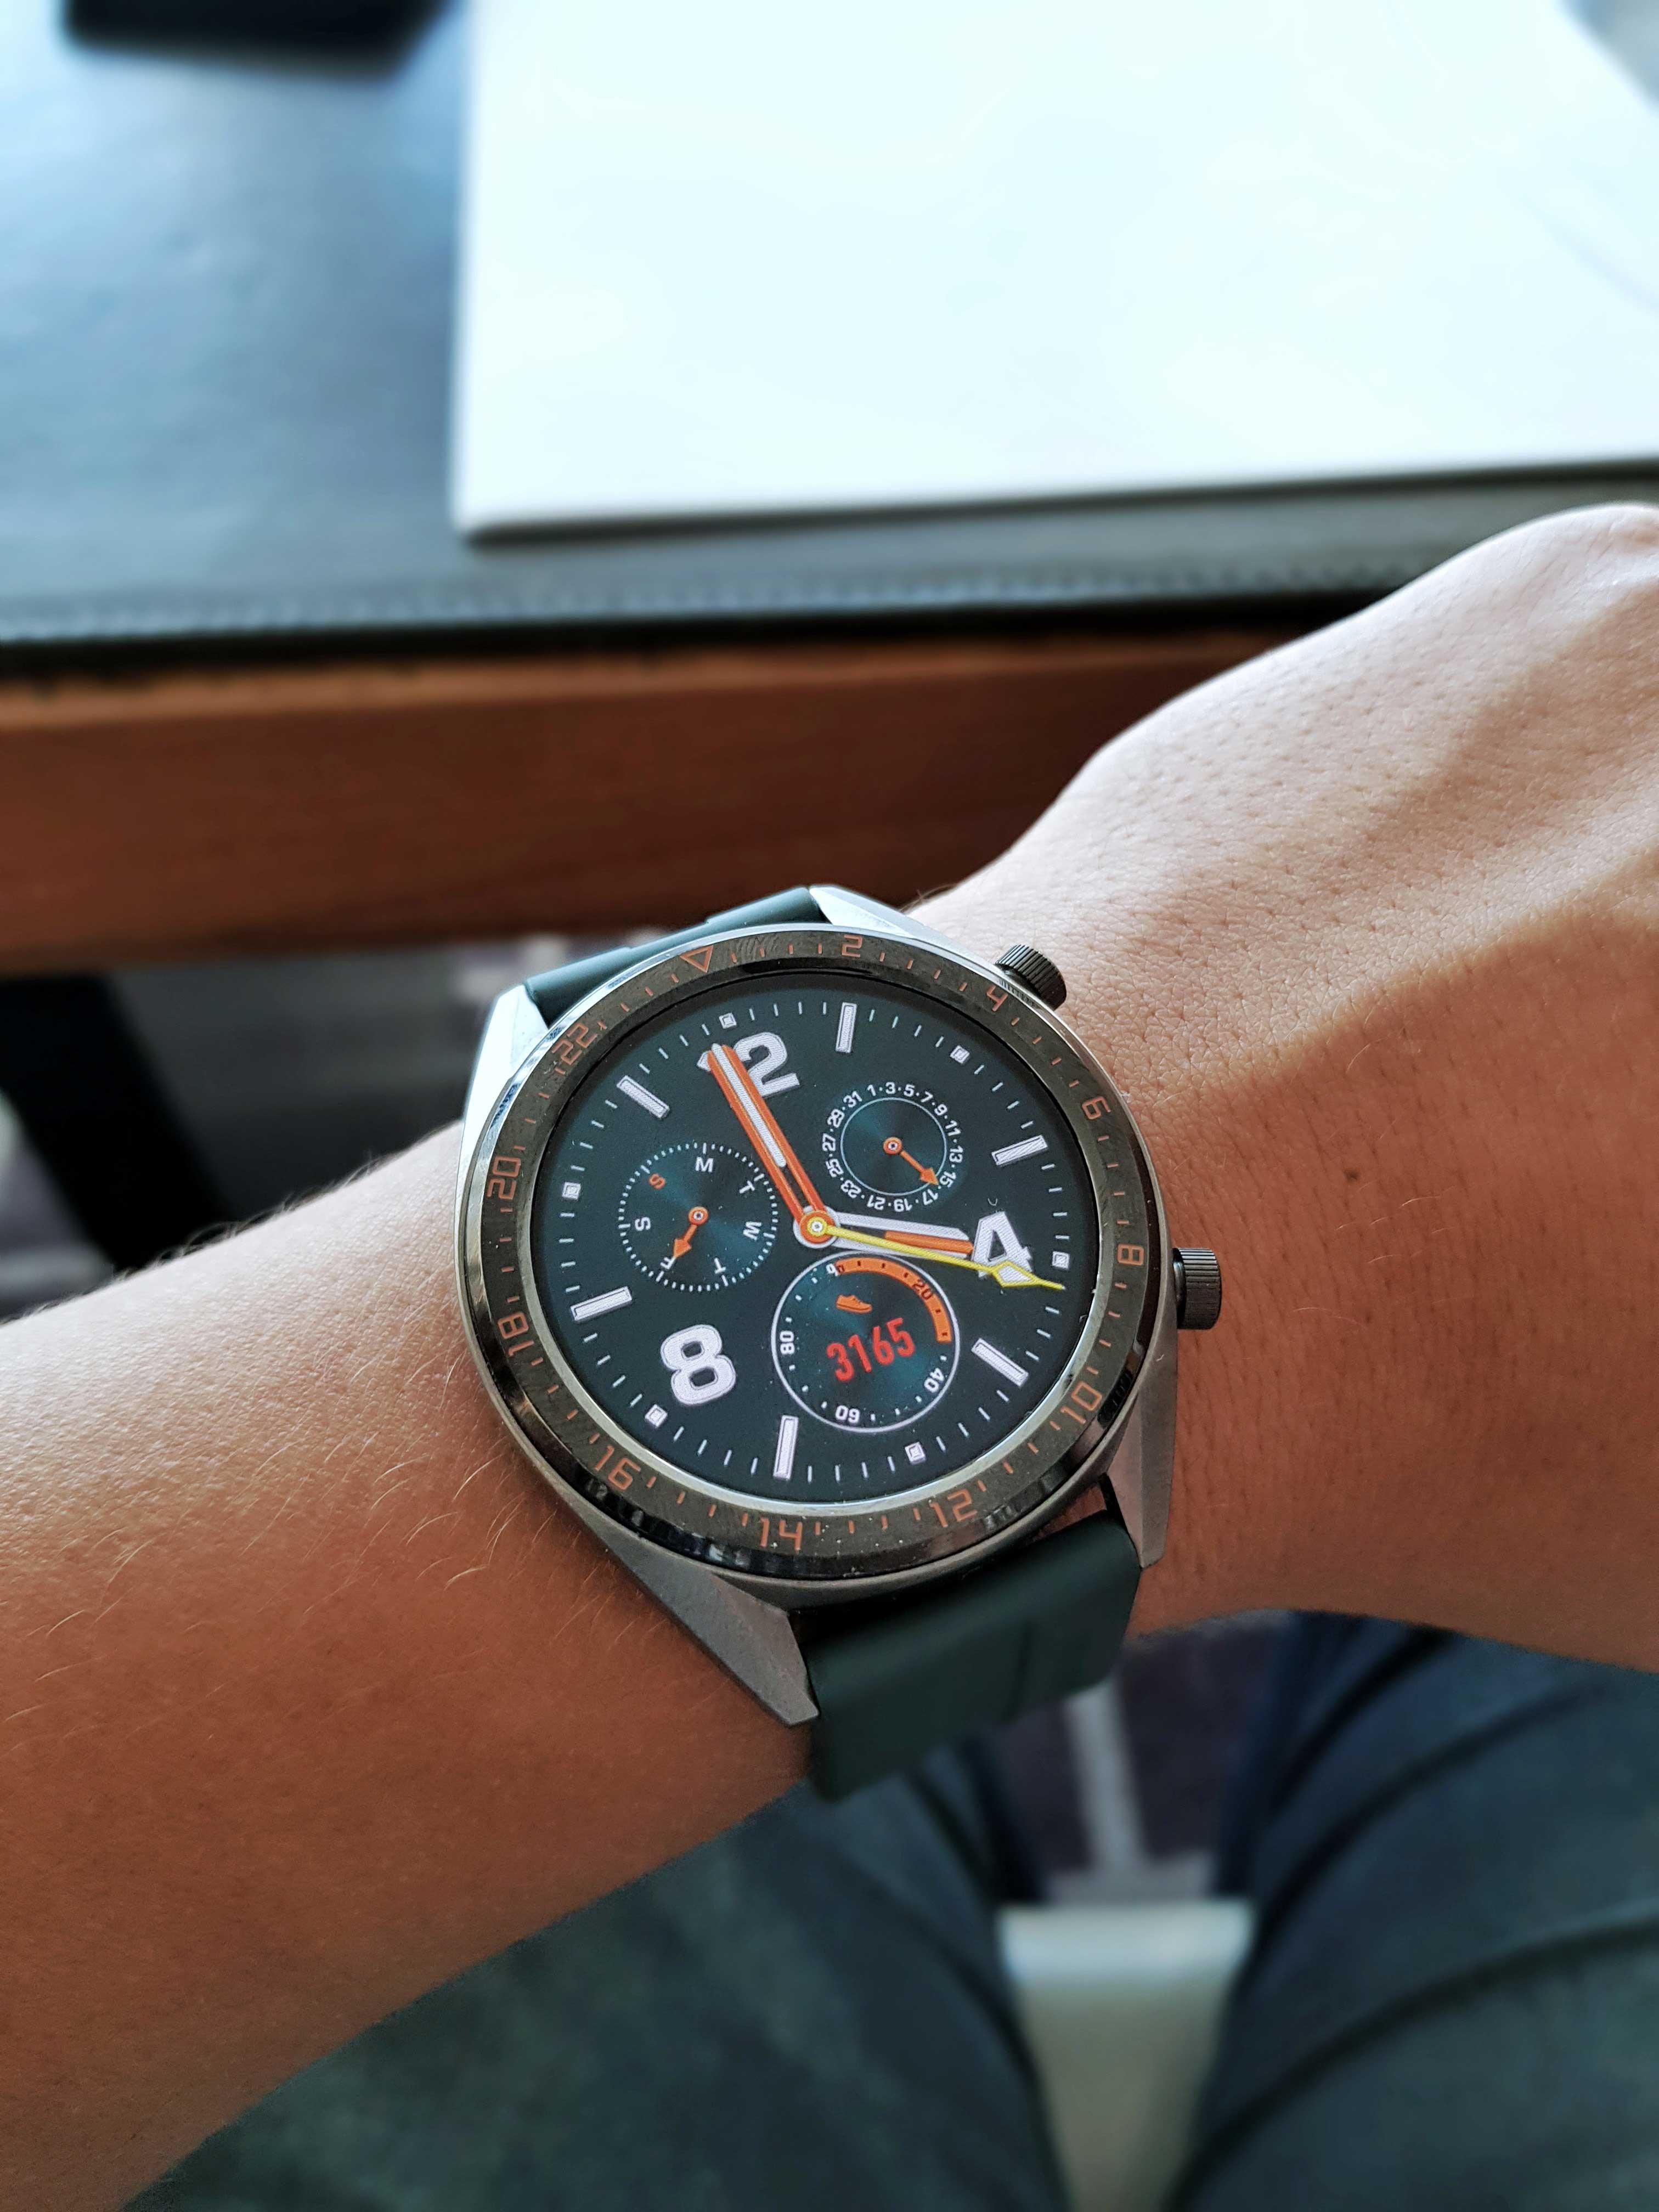 Ciddi batarya ile Huawei Watch GT Active spor saati Brezilya'ya ulaştı 2